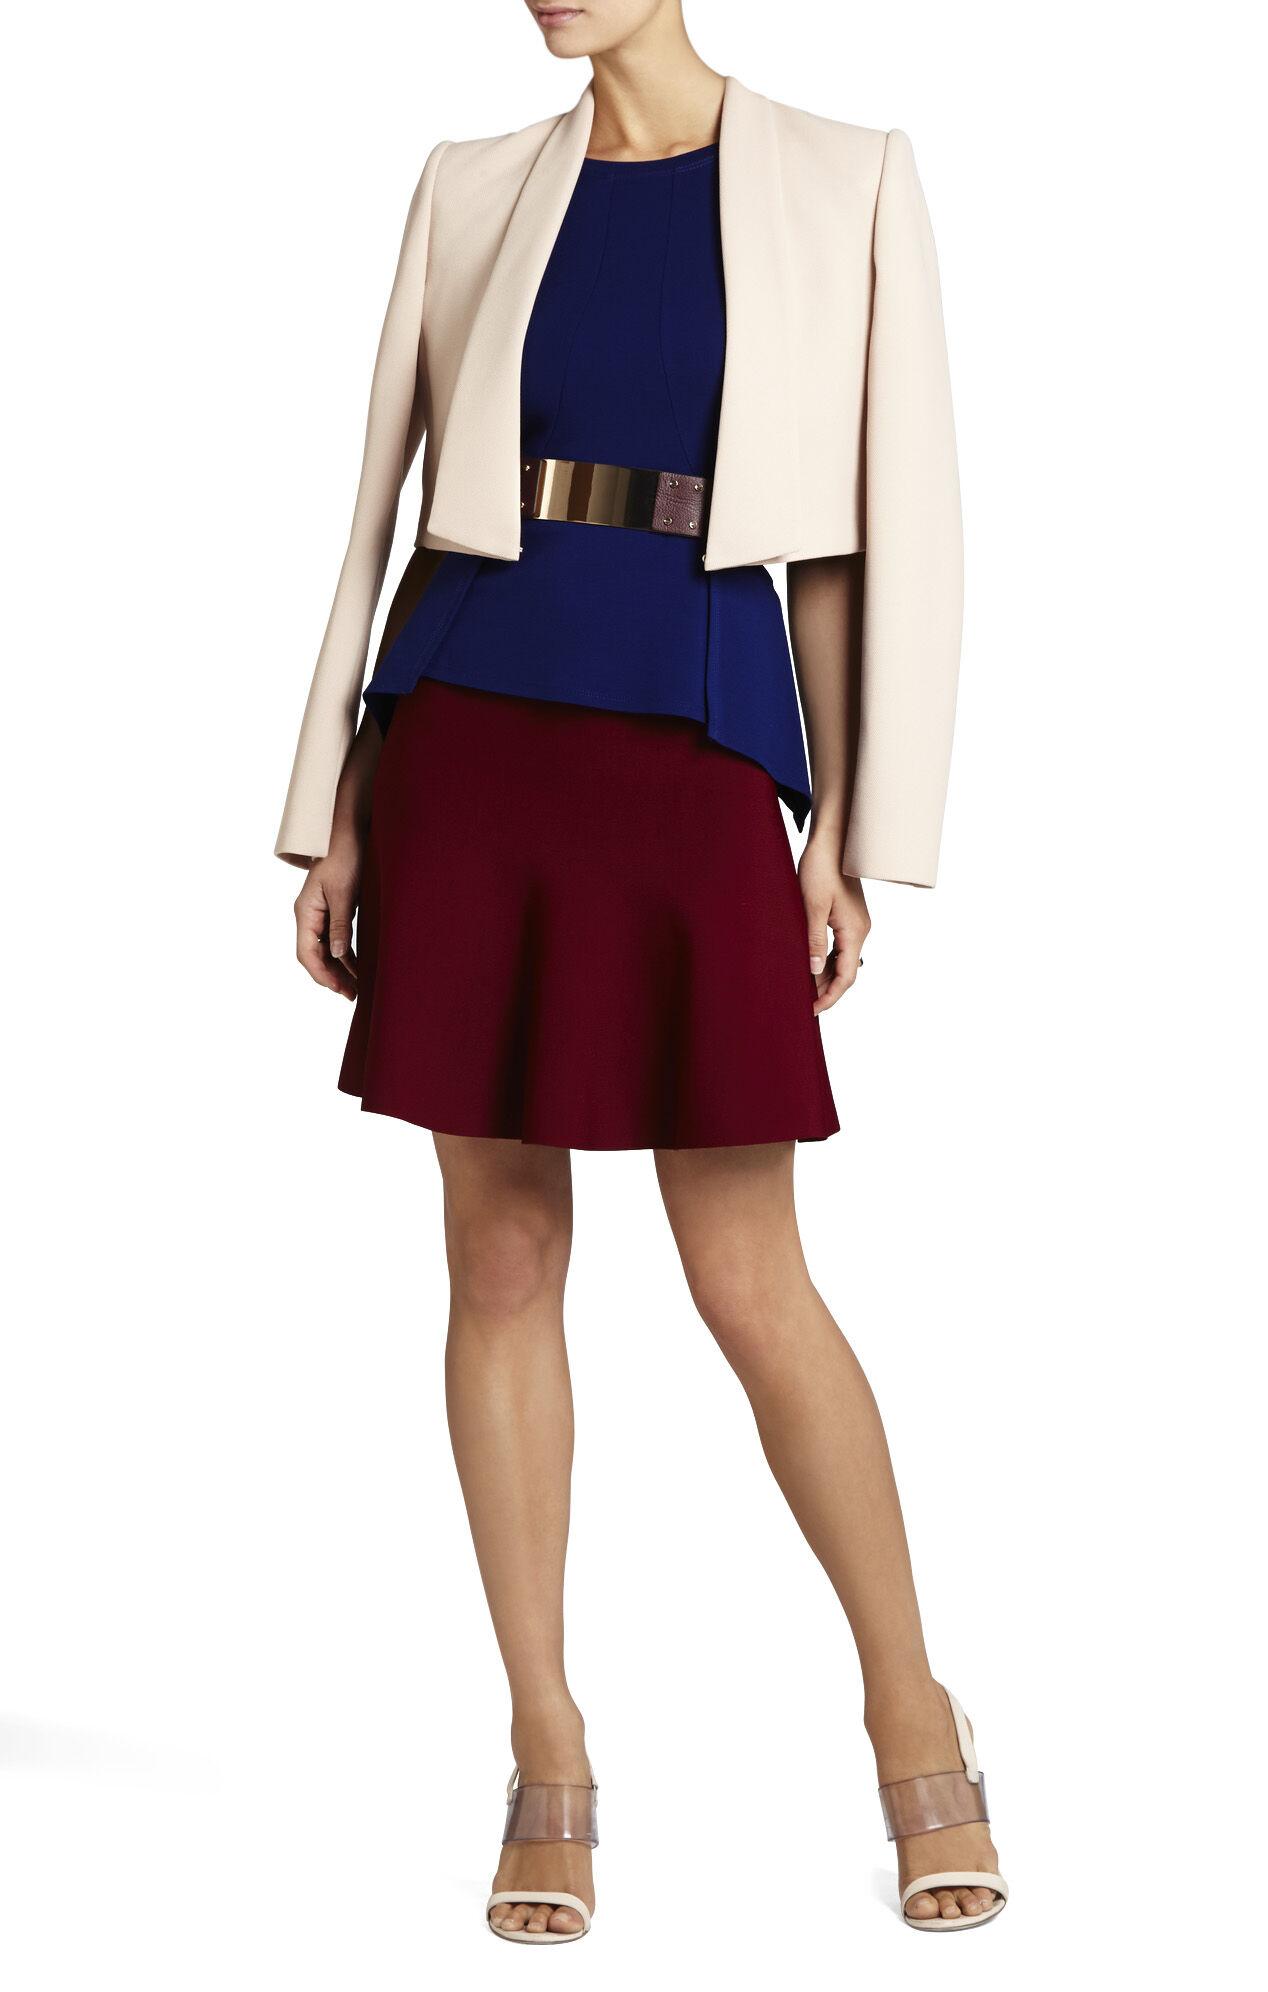 Ingrid A-Line Skirt